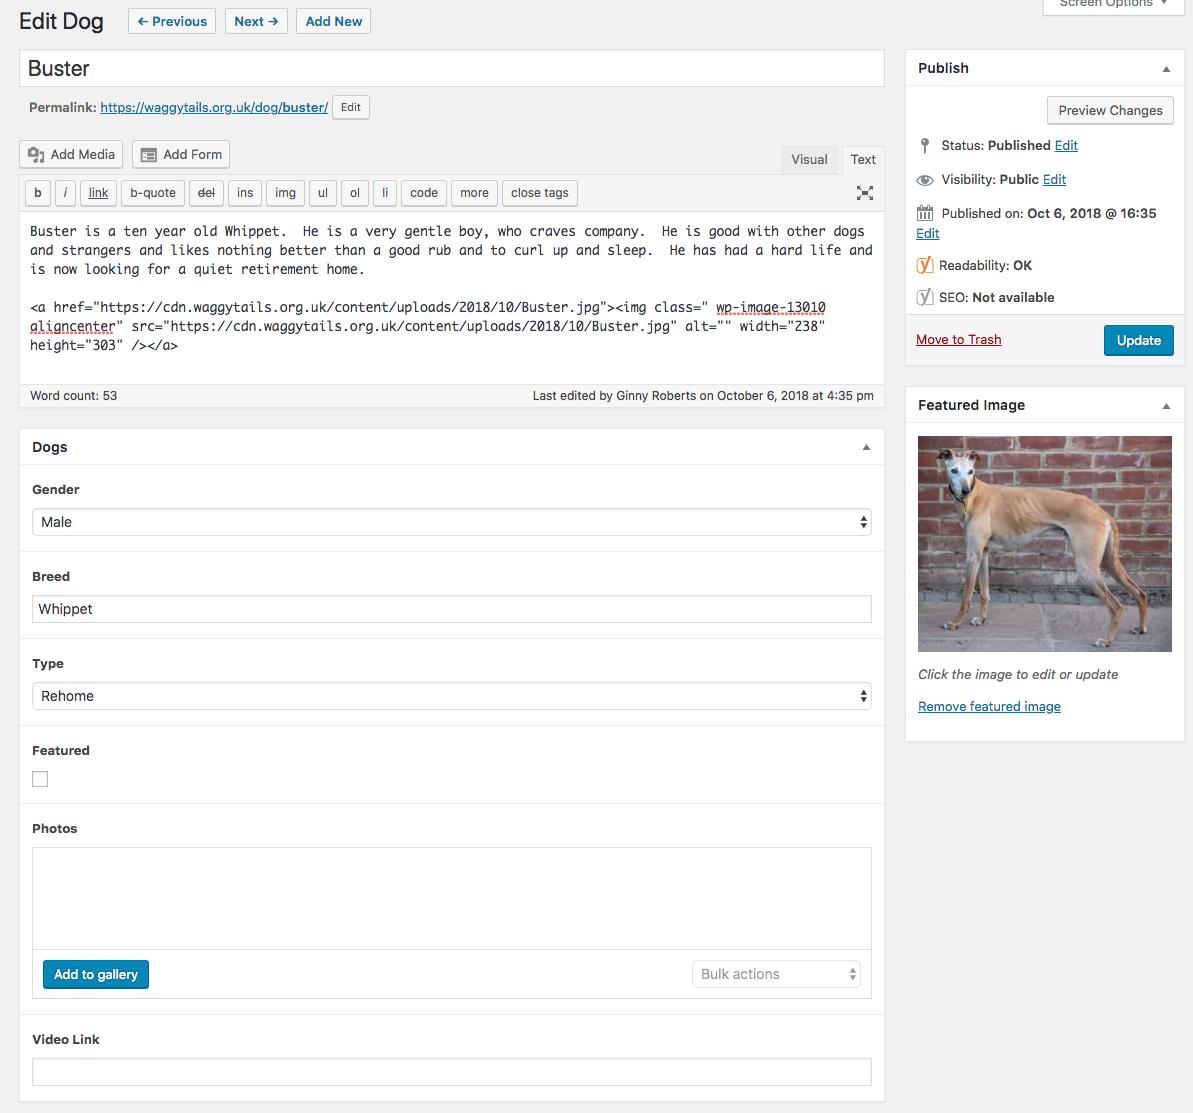 A post edit screen showing filled custom fields.